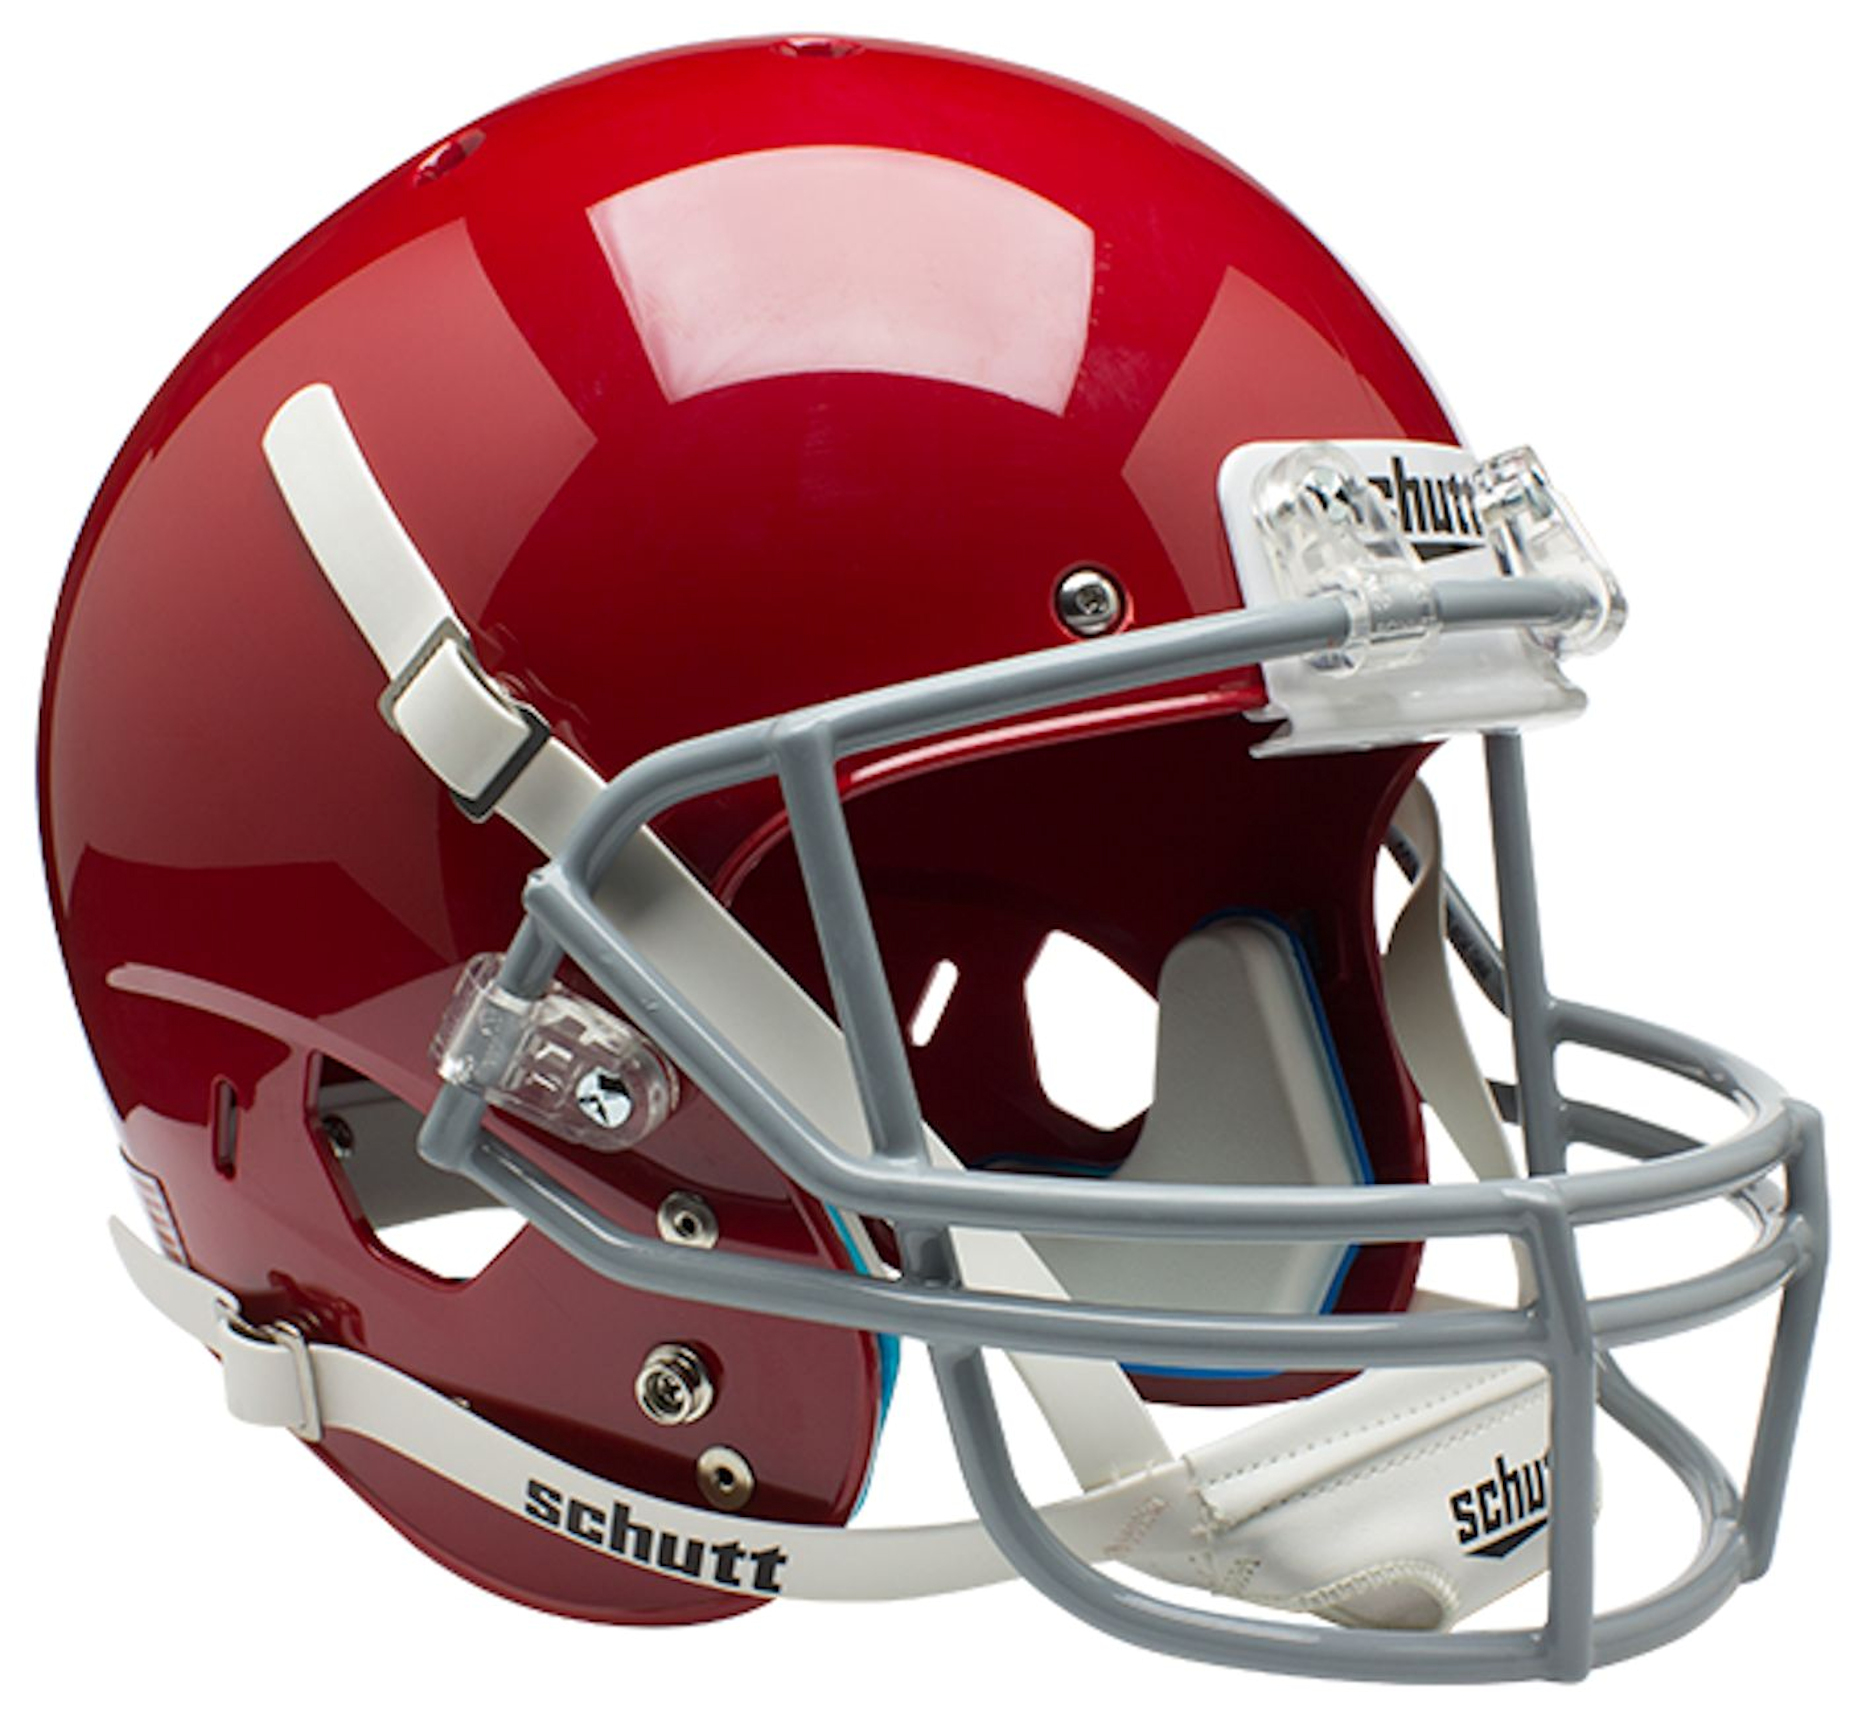 Ohio State Buckeyes Full XP Replica Football Helmet Schutt <B>Scarlet</B>